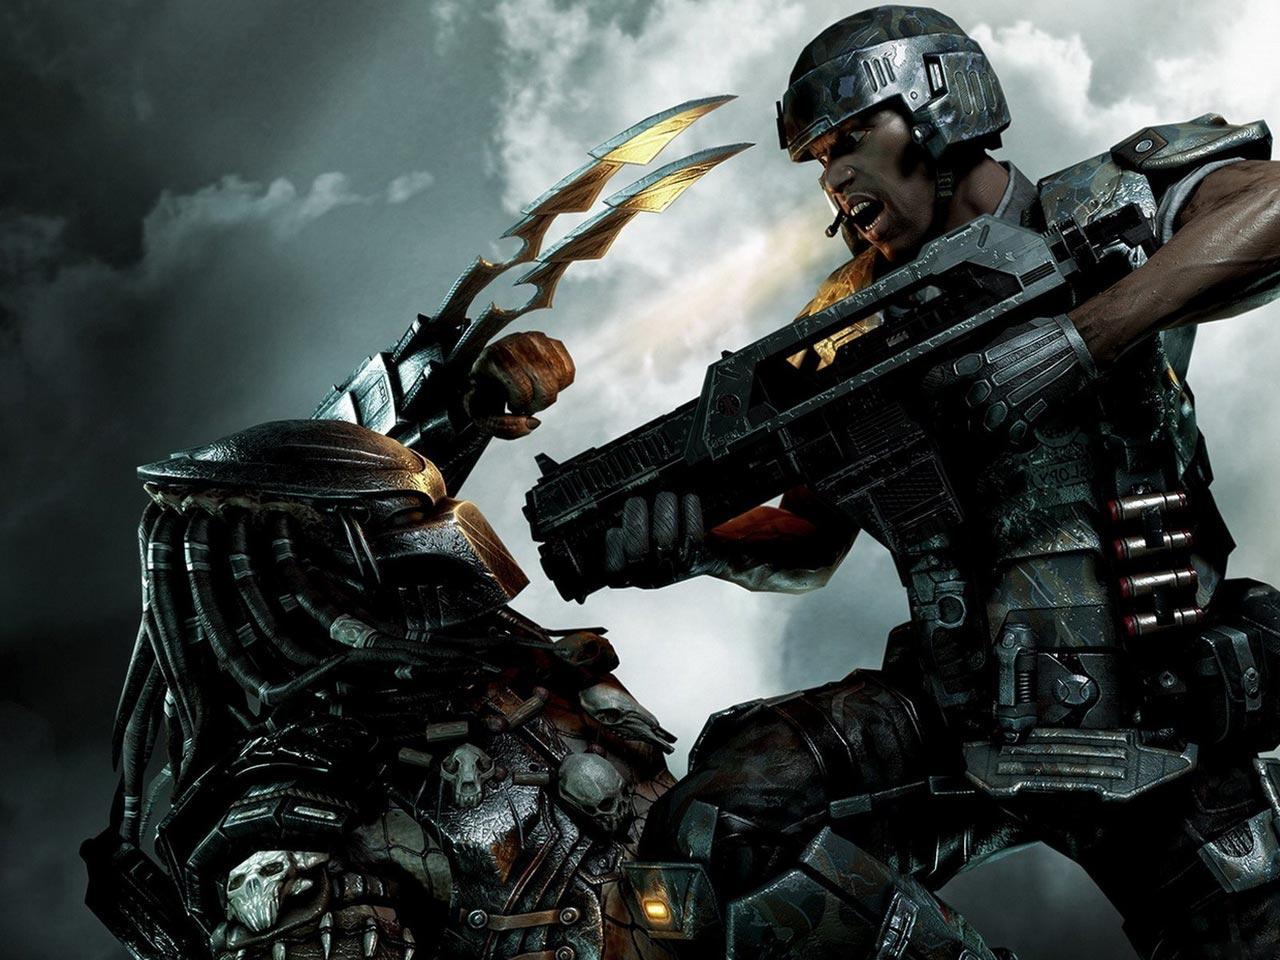 http://1.bp.blogspot.com/-WvX28_w26ms/UGshxV98DuI/AAAAAAAAAaw/aI-Ed26CI5o/s1600/aliens-vs-predator-game-wallpaper.jpg